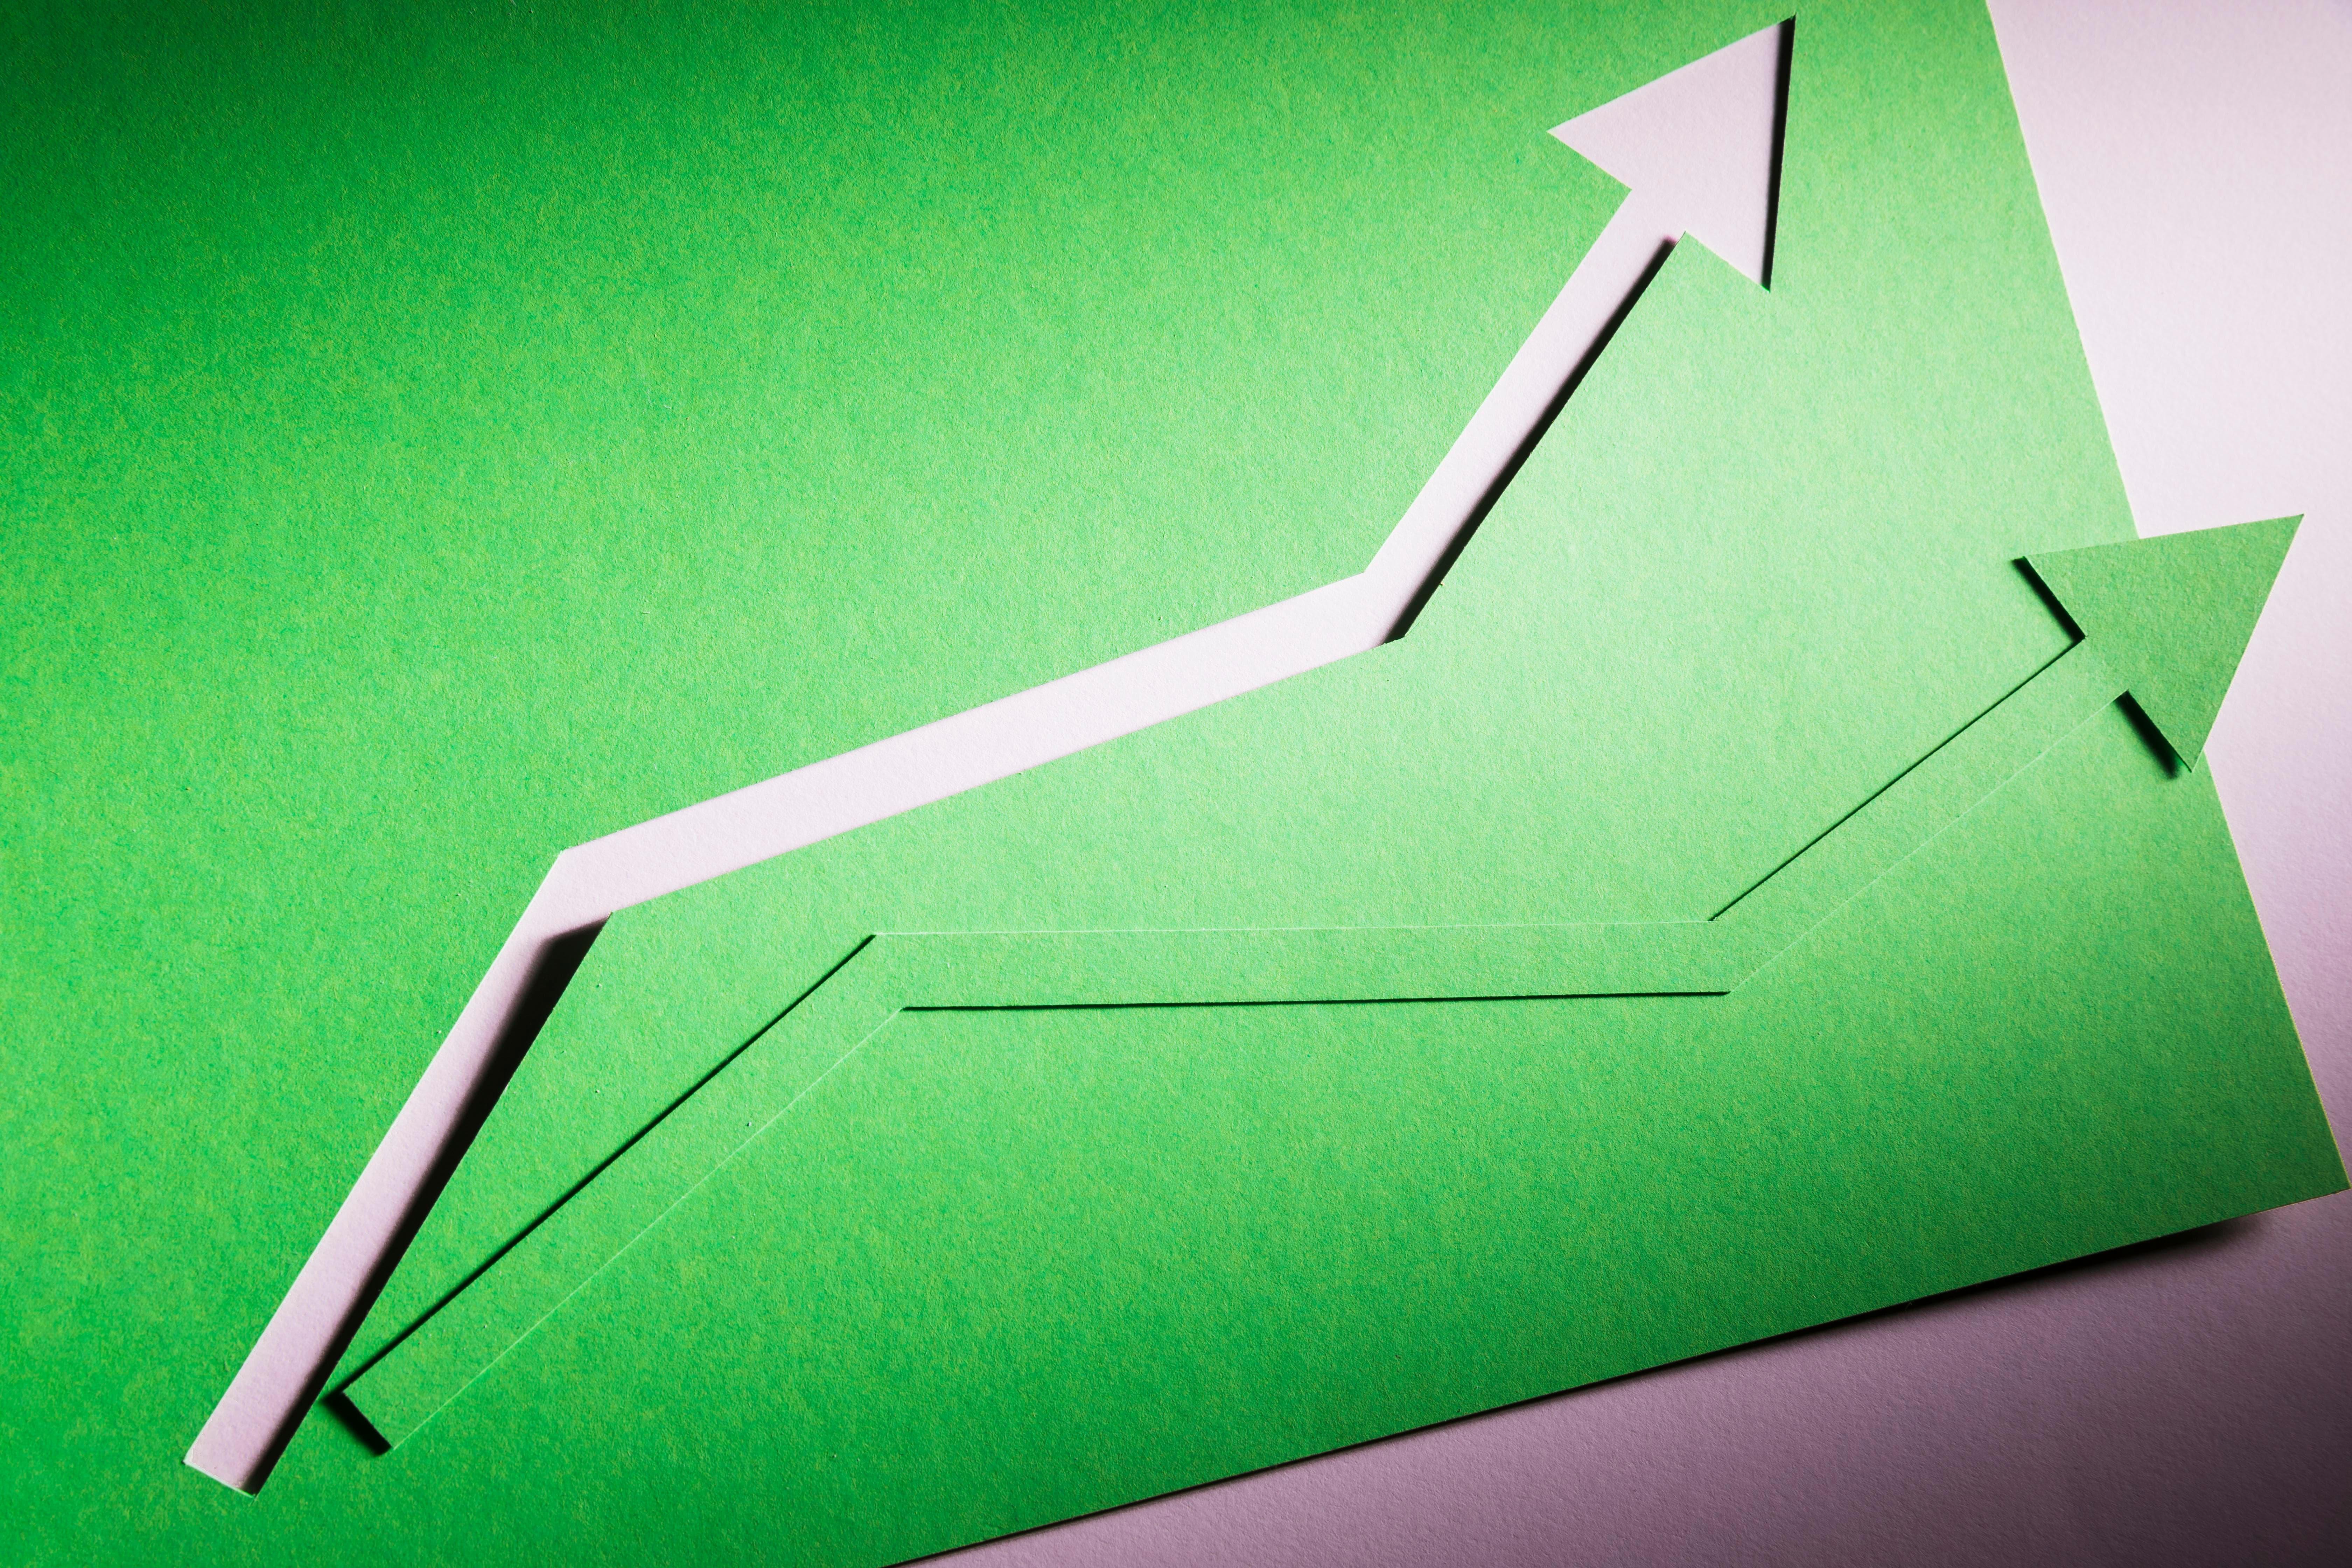 Economia circular pode representar crescimento econômico,segundo a União Europeia.